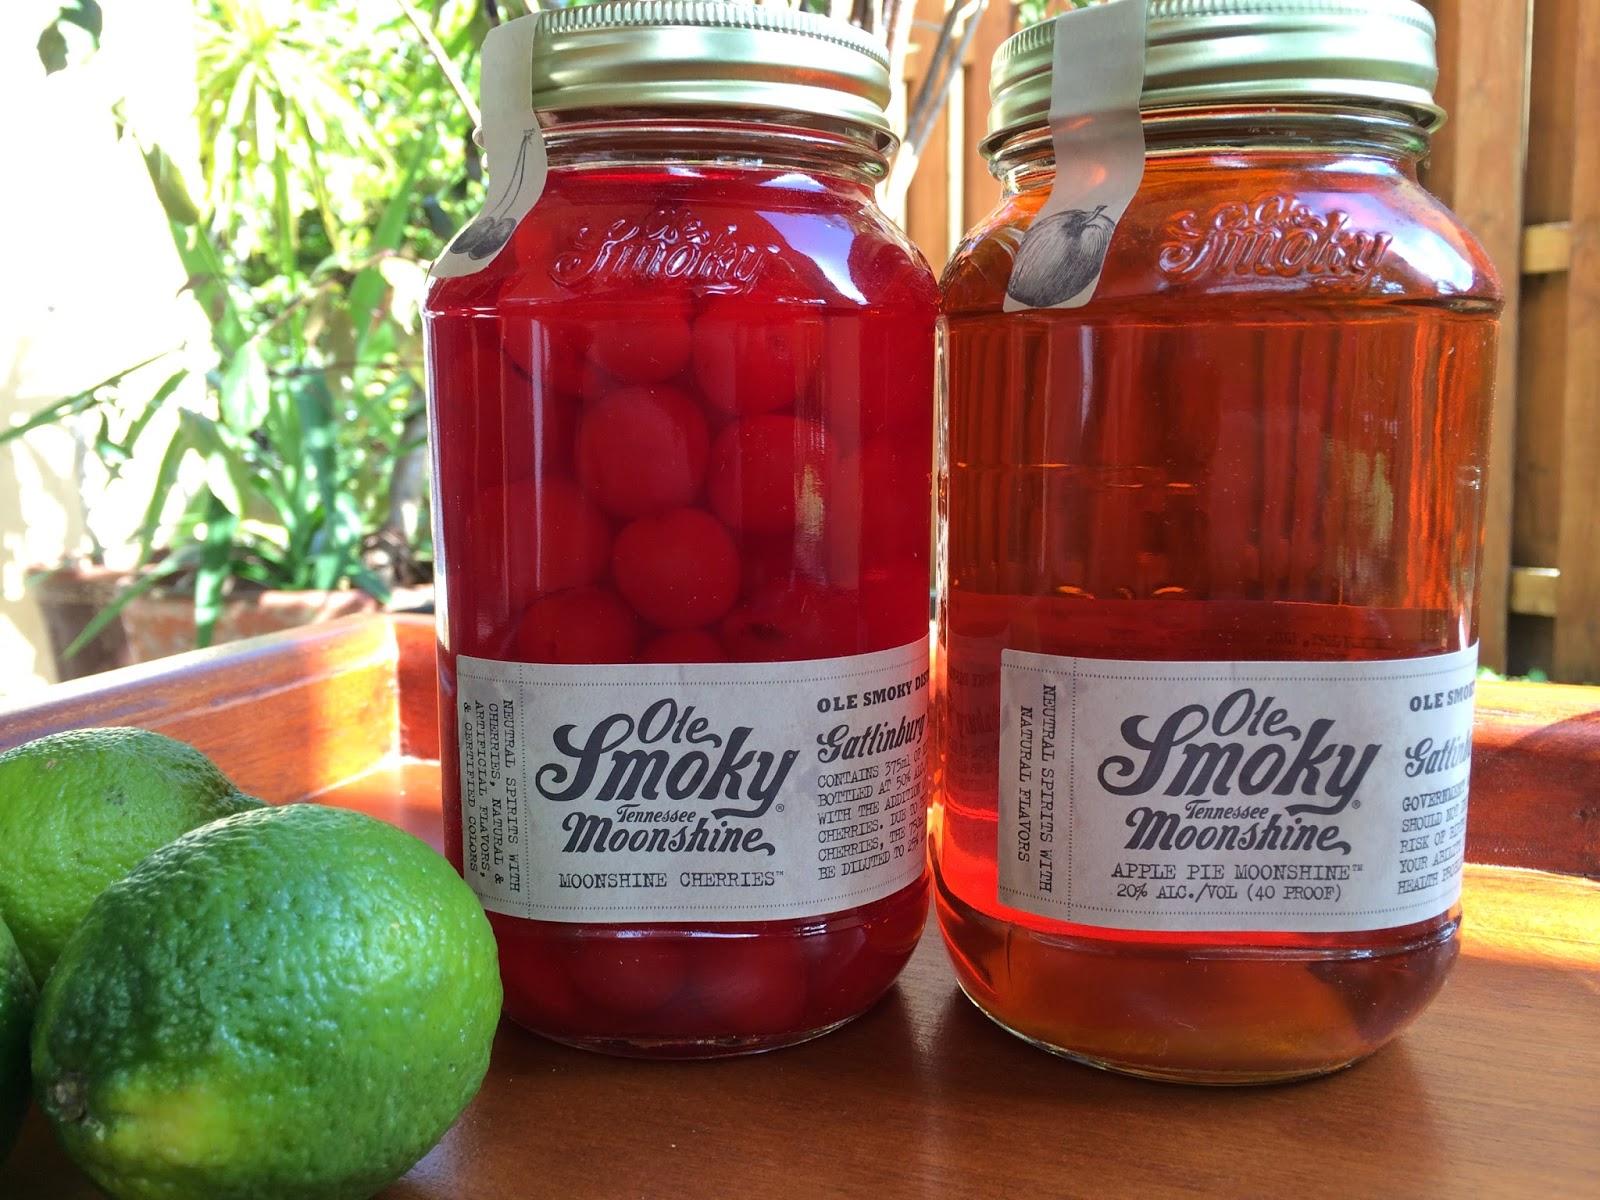 ole smoky apple pie moonshine - photo #19